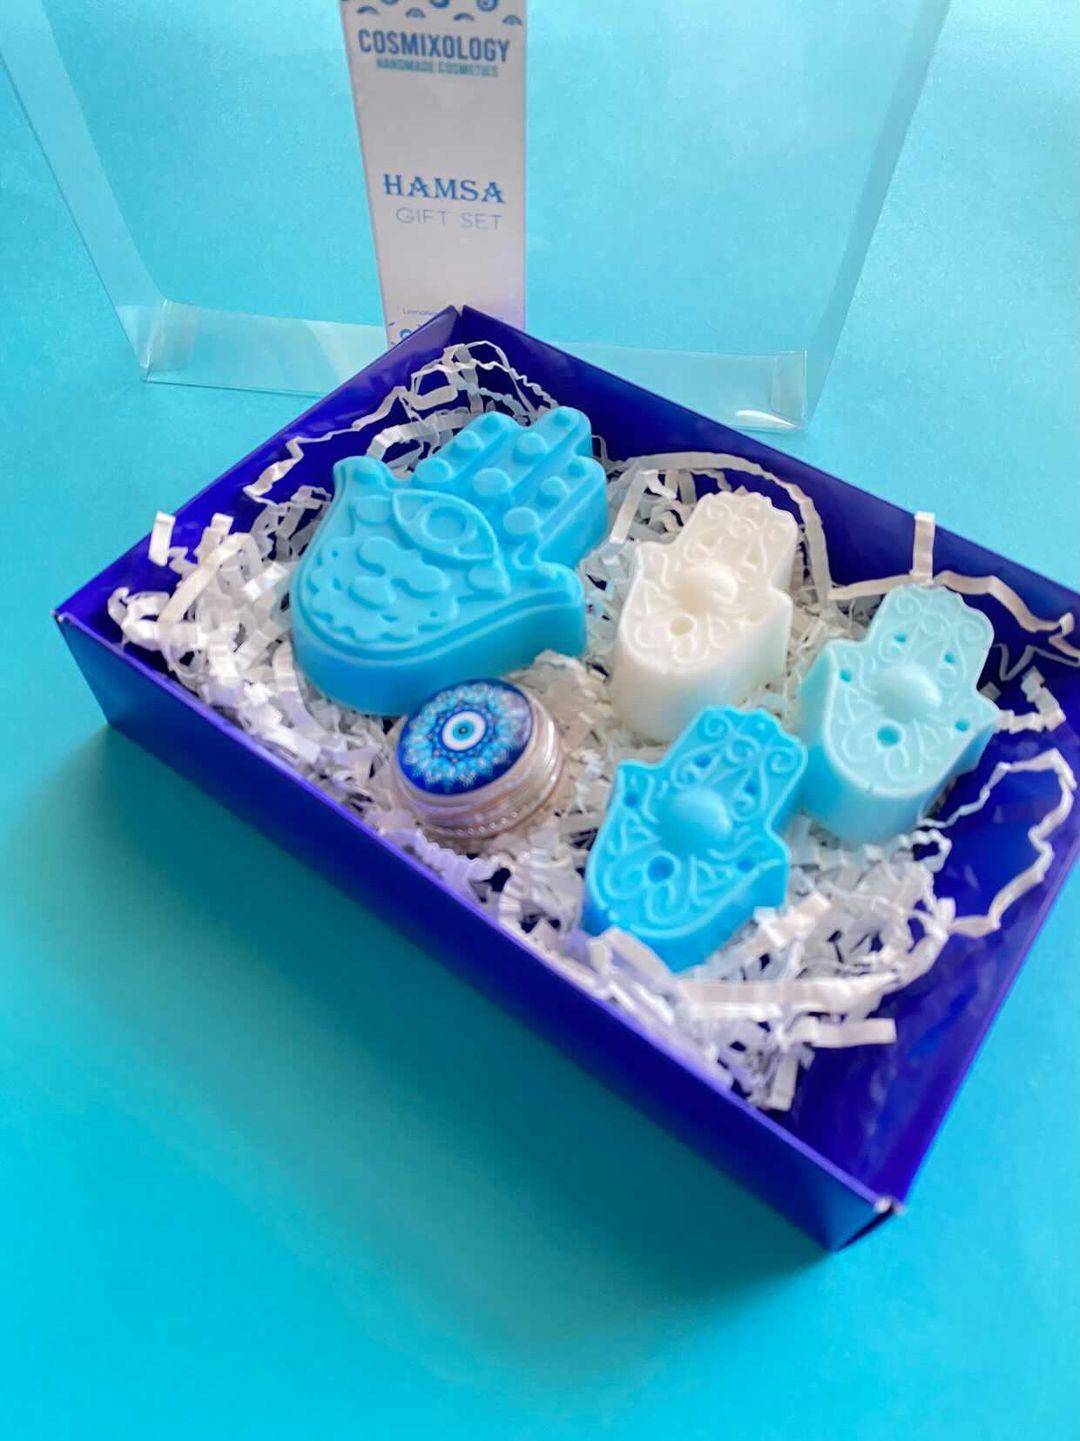 Hamsa Organic & Natural Soap and Lip Tint Gift Set - Uplifting Lemongrass & Clary Sage